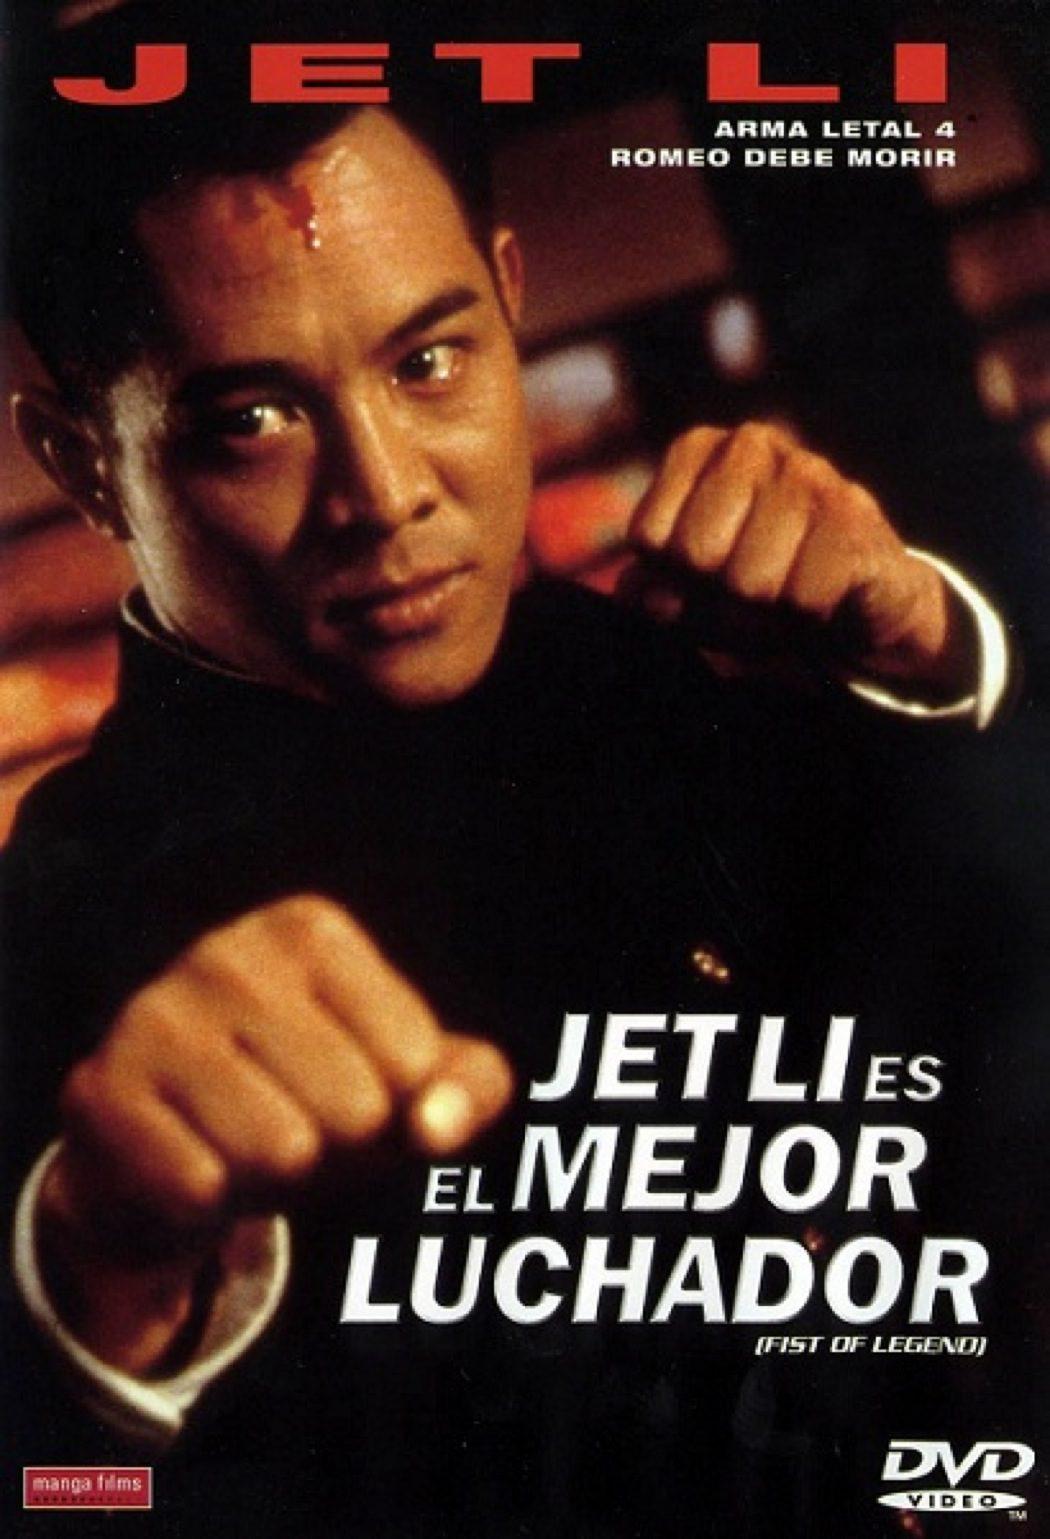 'Jet Li es el mejor luchador'